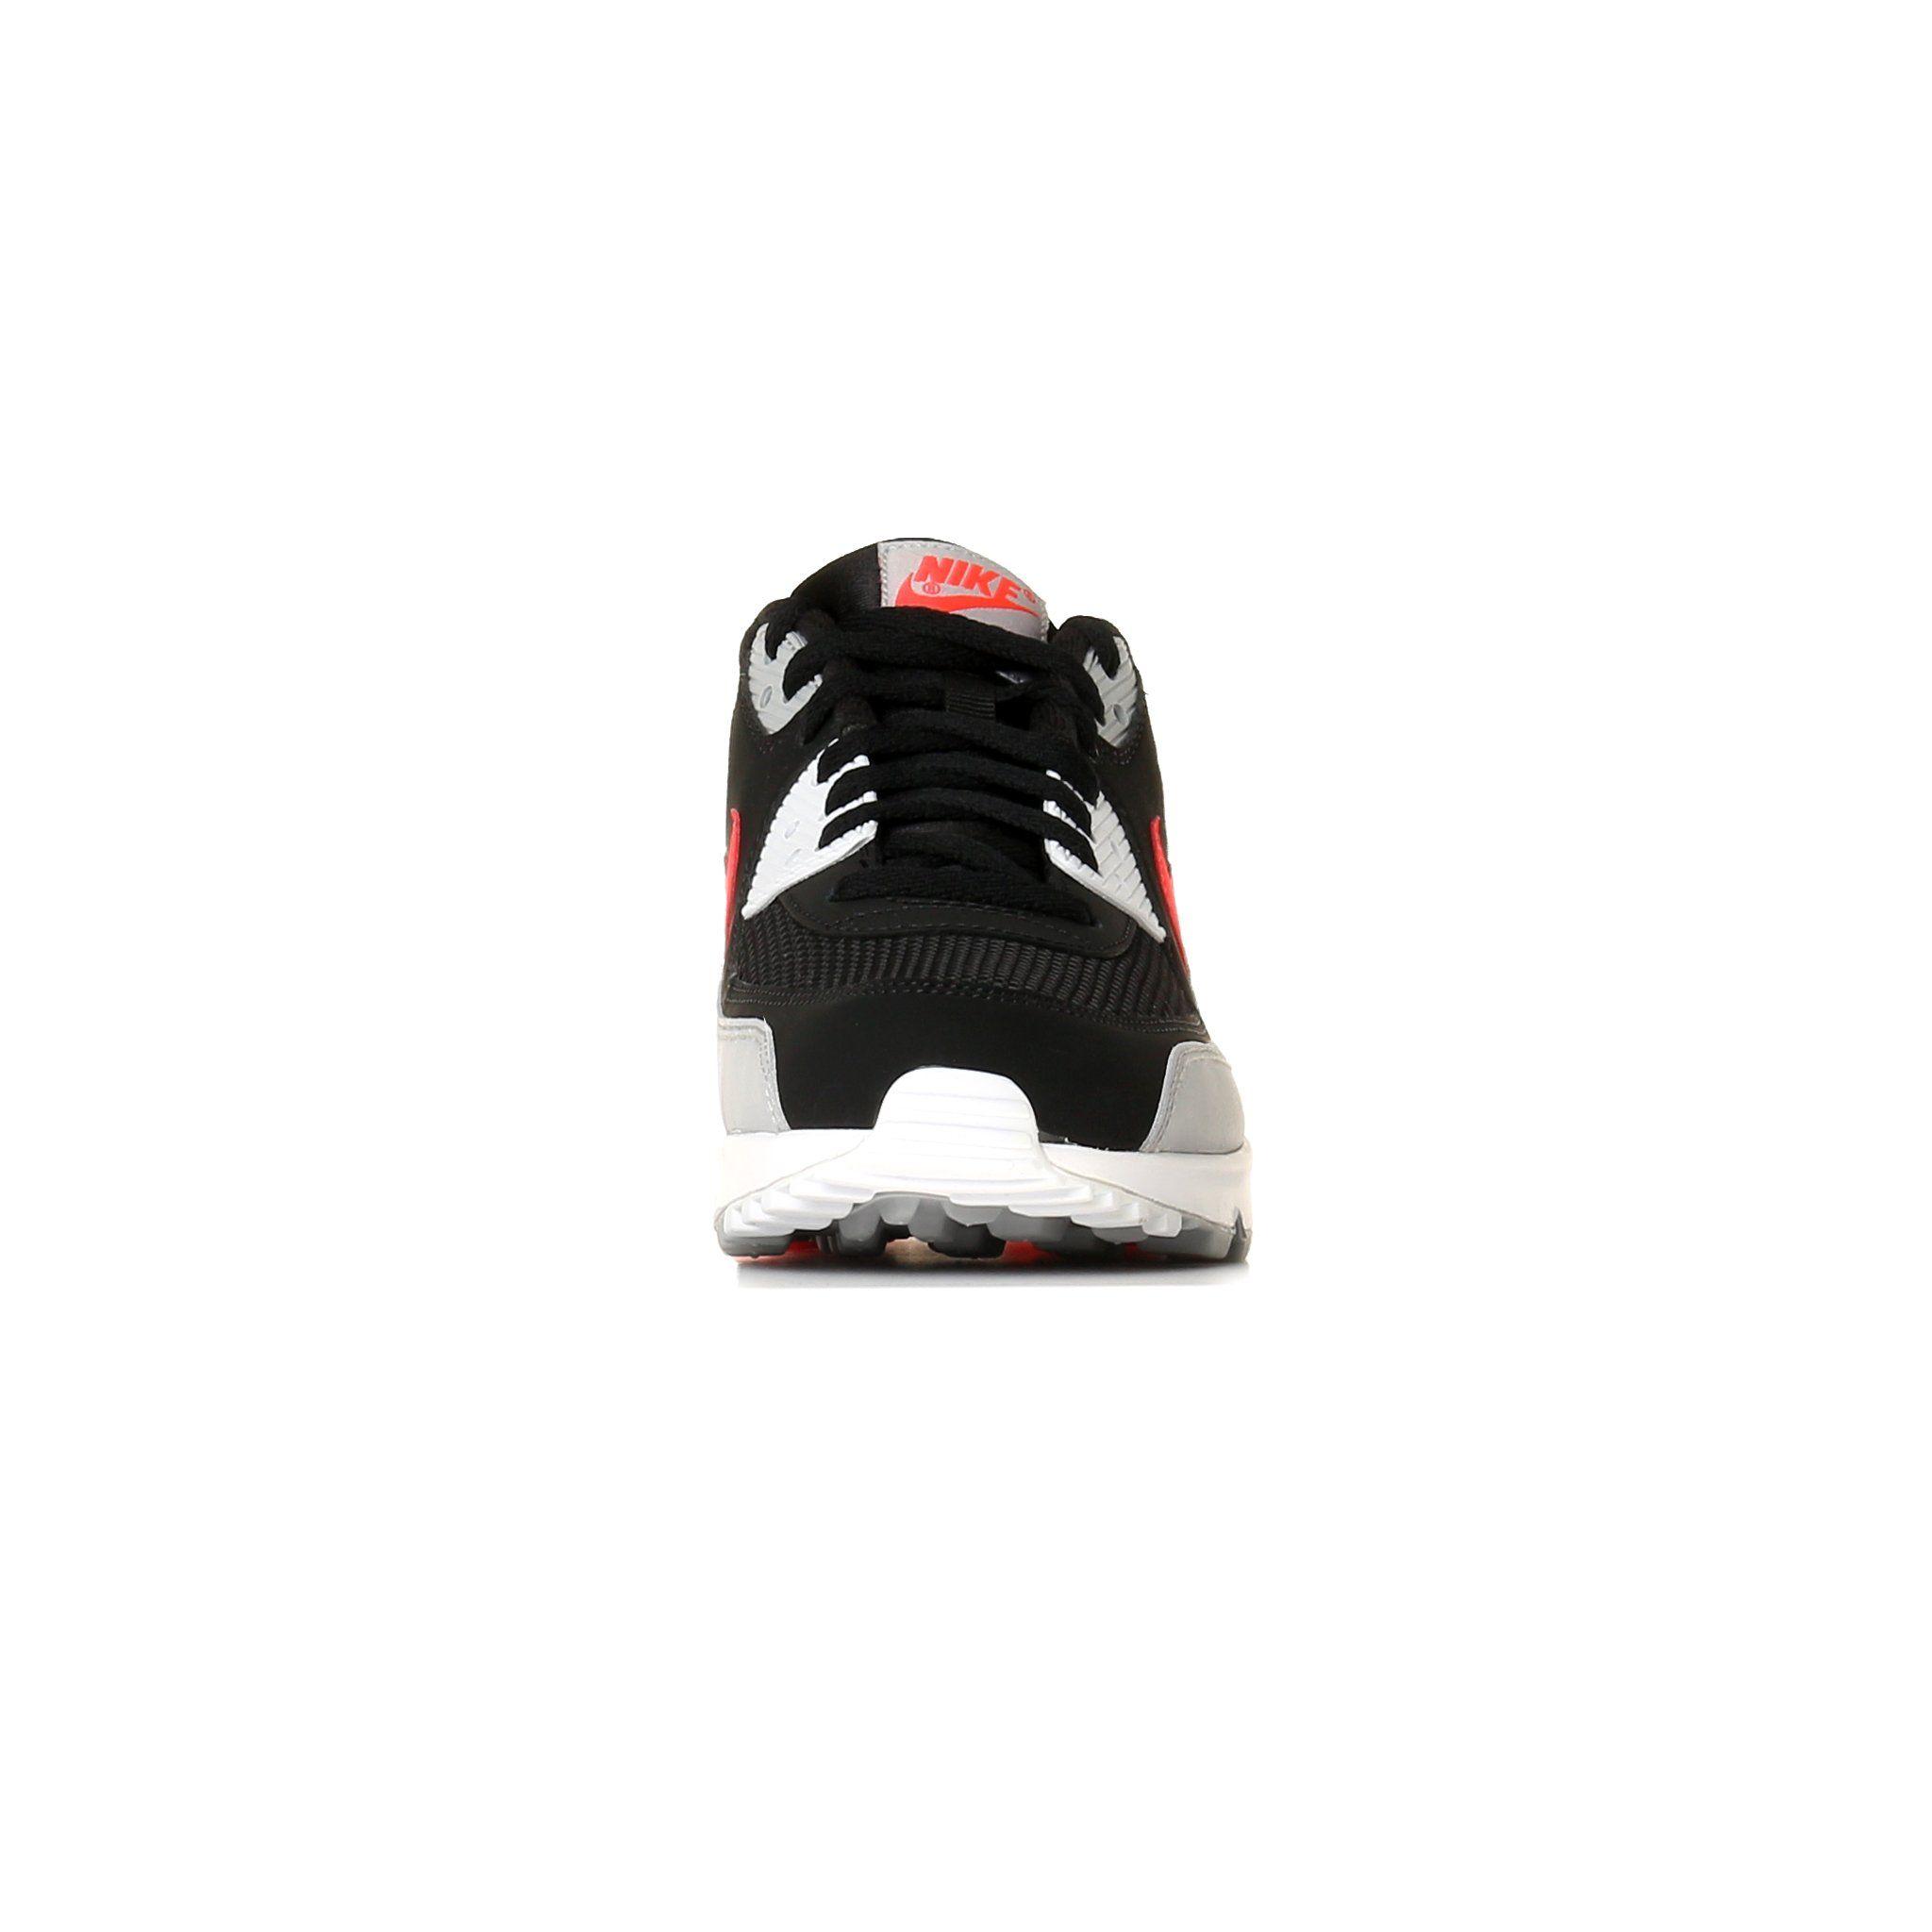 Nike Air Max 90 Essential Wolf Grey Bright Crimson UK